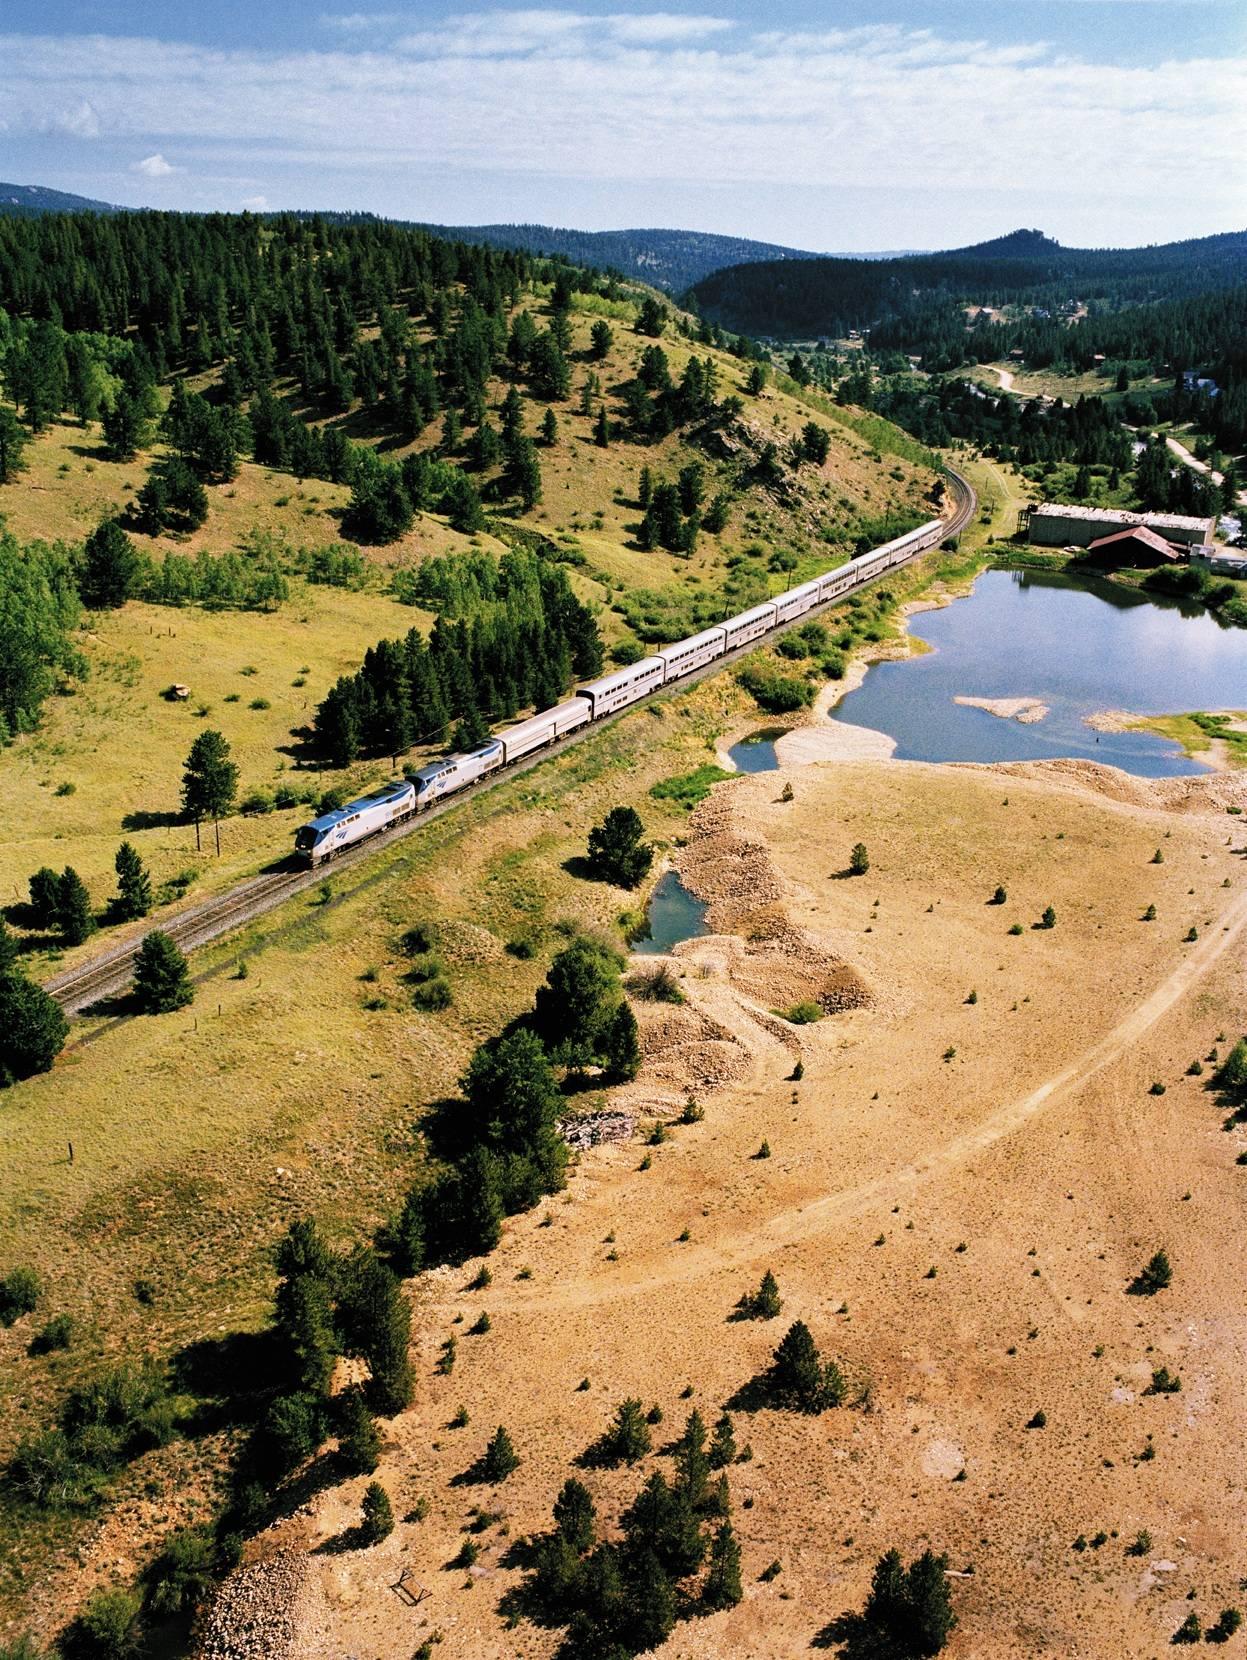 11-Day Pacific Coast Tour From LA W/ Amtrak Coast Starlight Train & Las Vegas